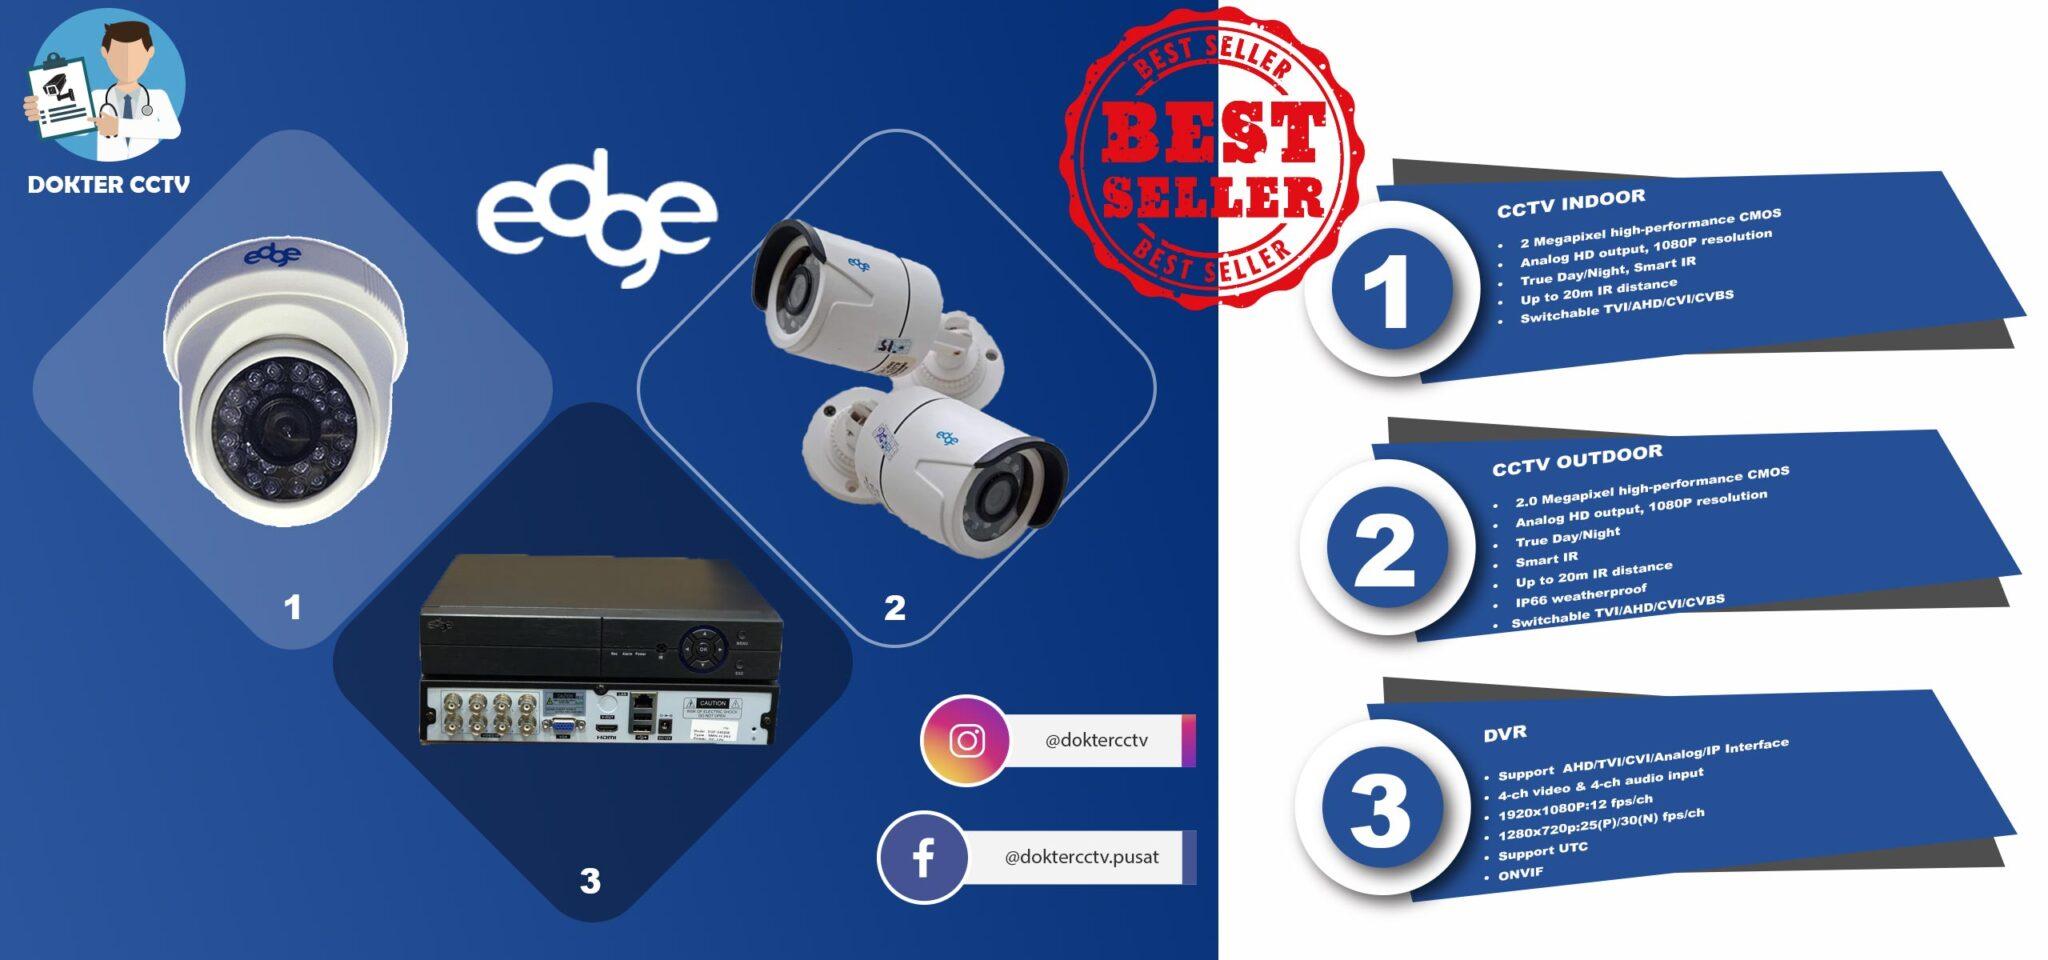 CCTV EDGE - DOKTER CCTV